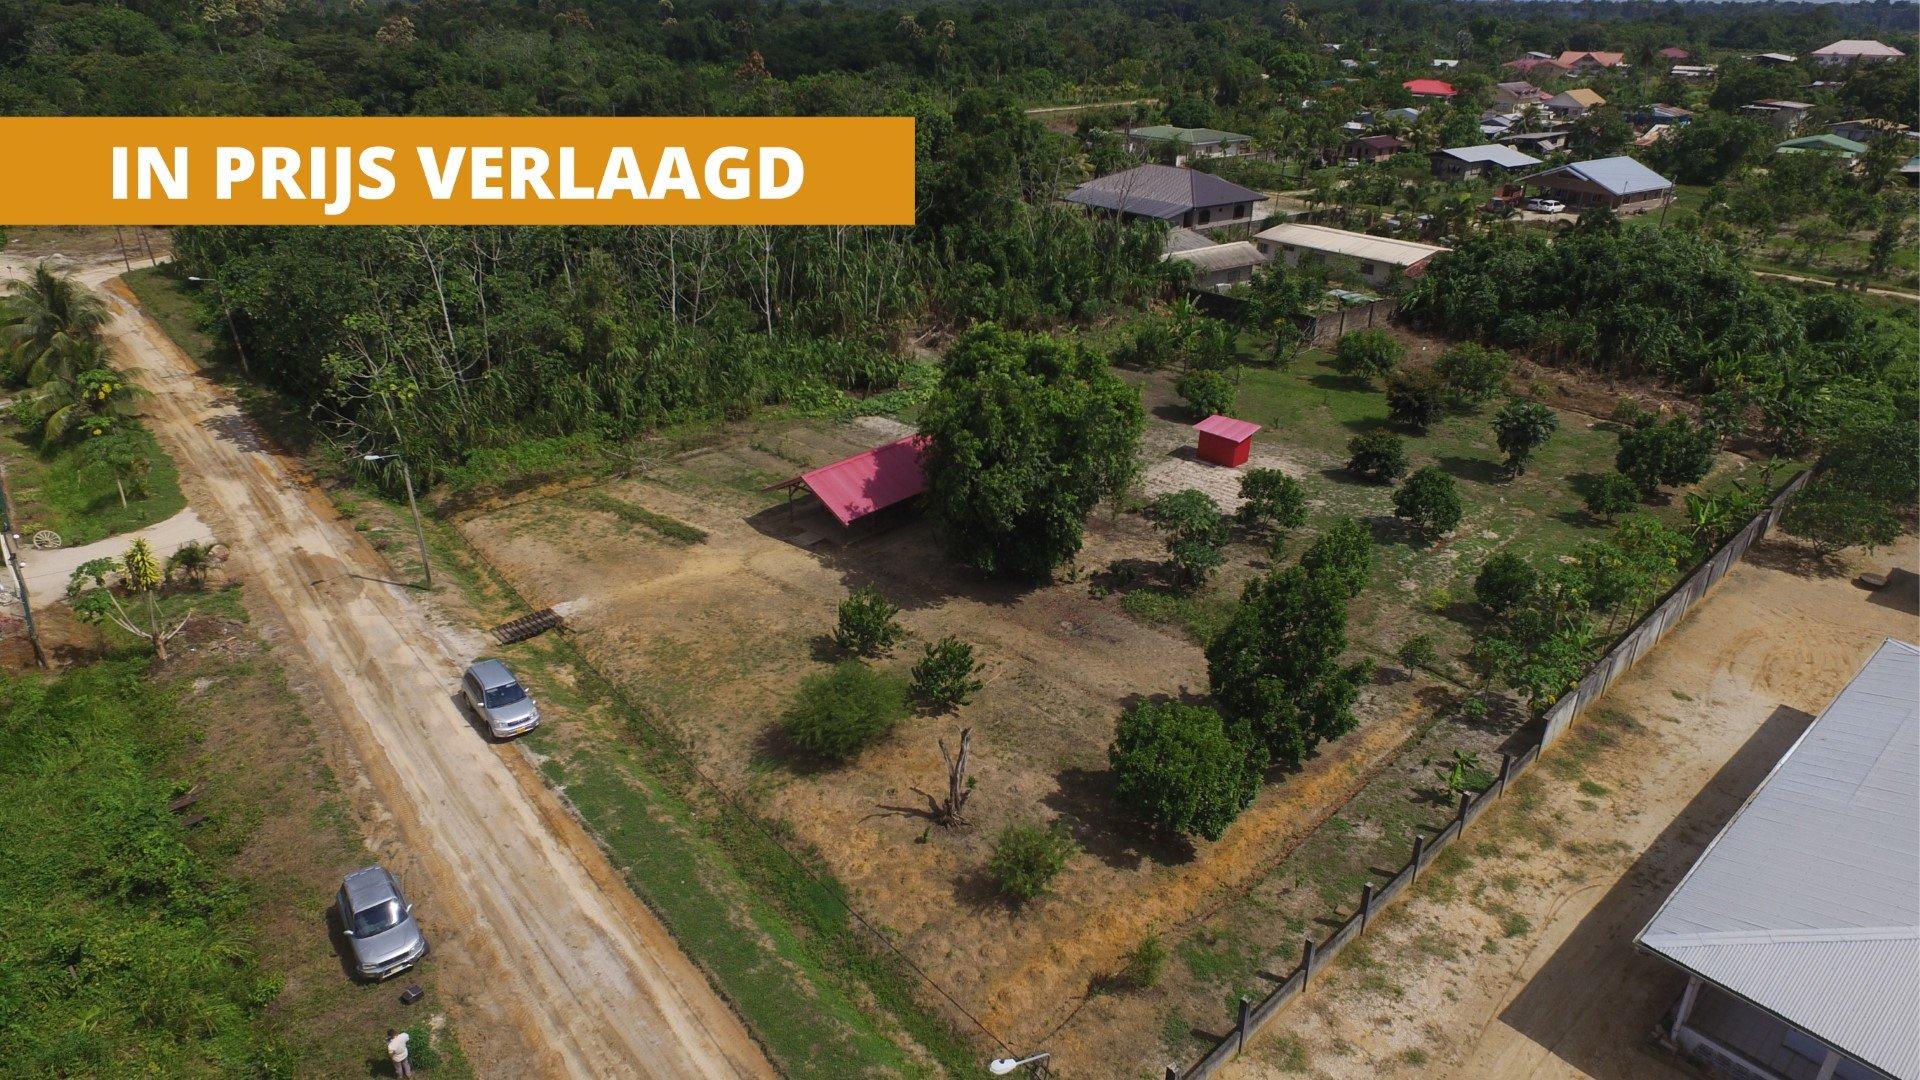 Dammalangprojekt 128-129 - Bouwrijpe kavel te Saramacca - Surgoed Makelaardij NV - Paramaribo, Suriname